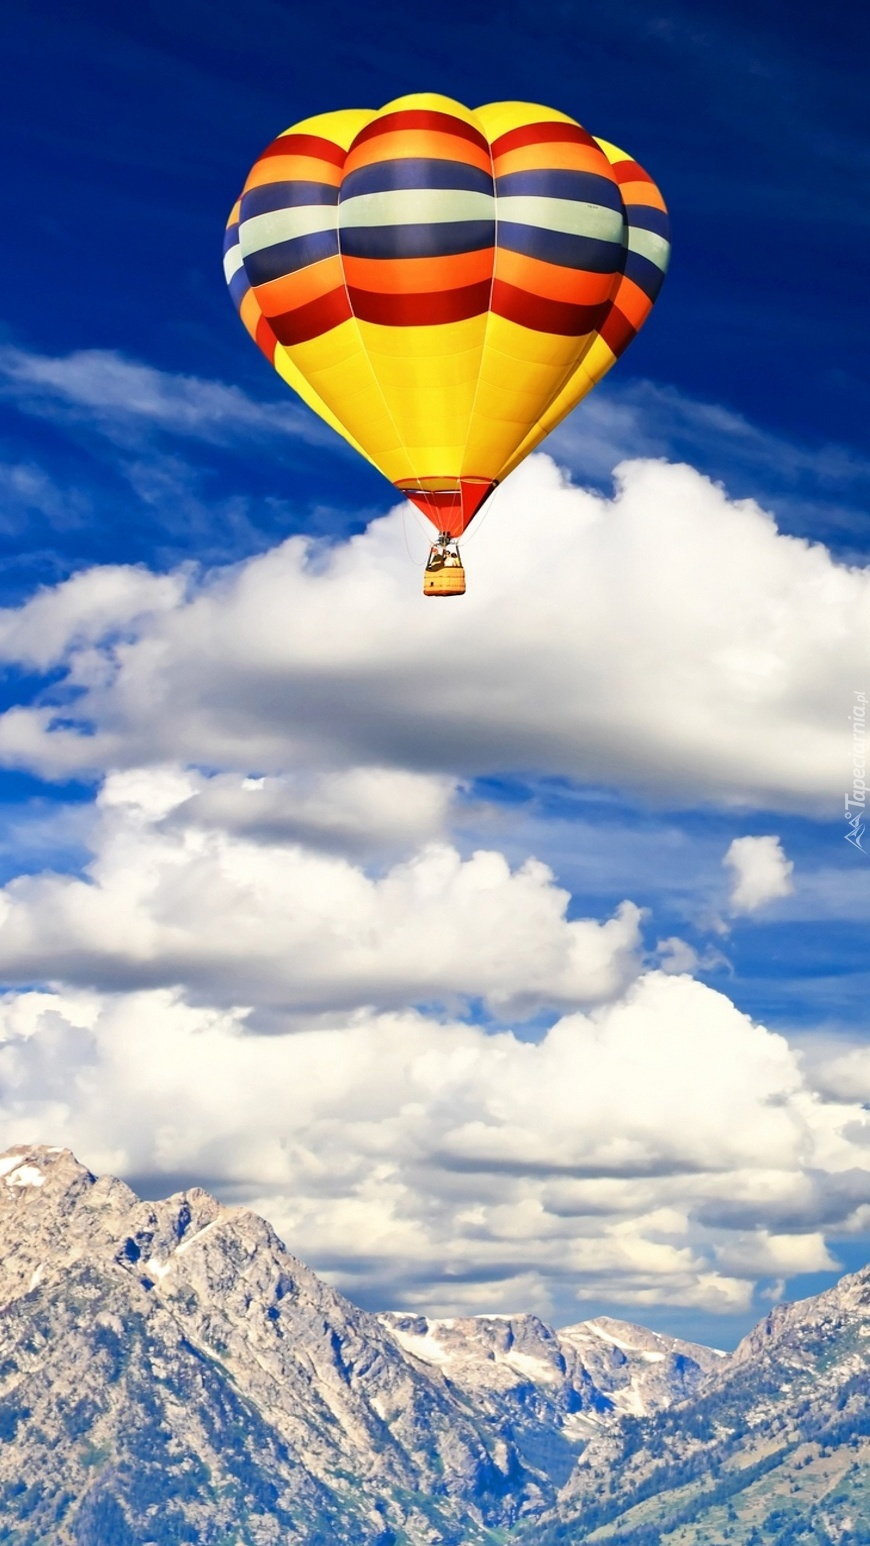 Balon nad górami